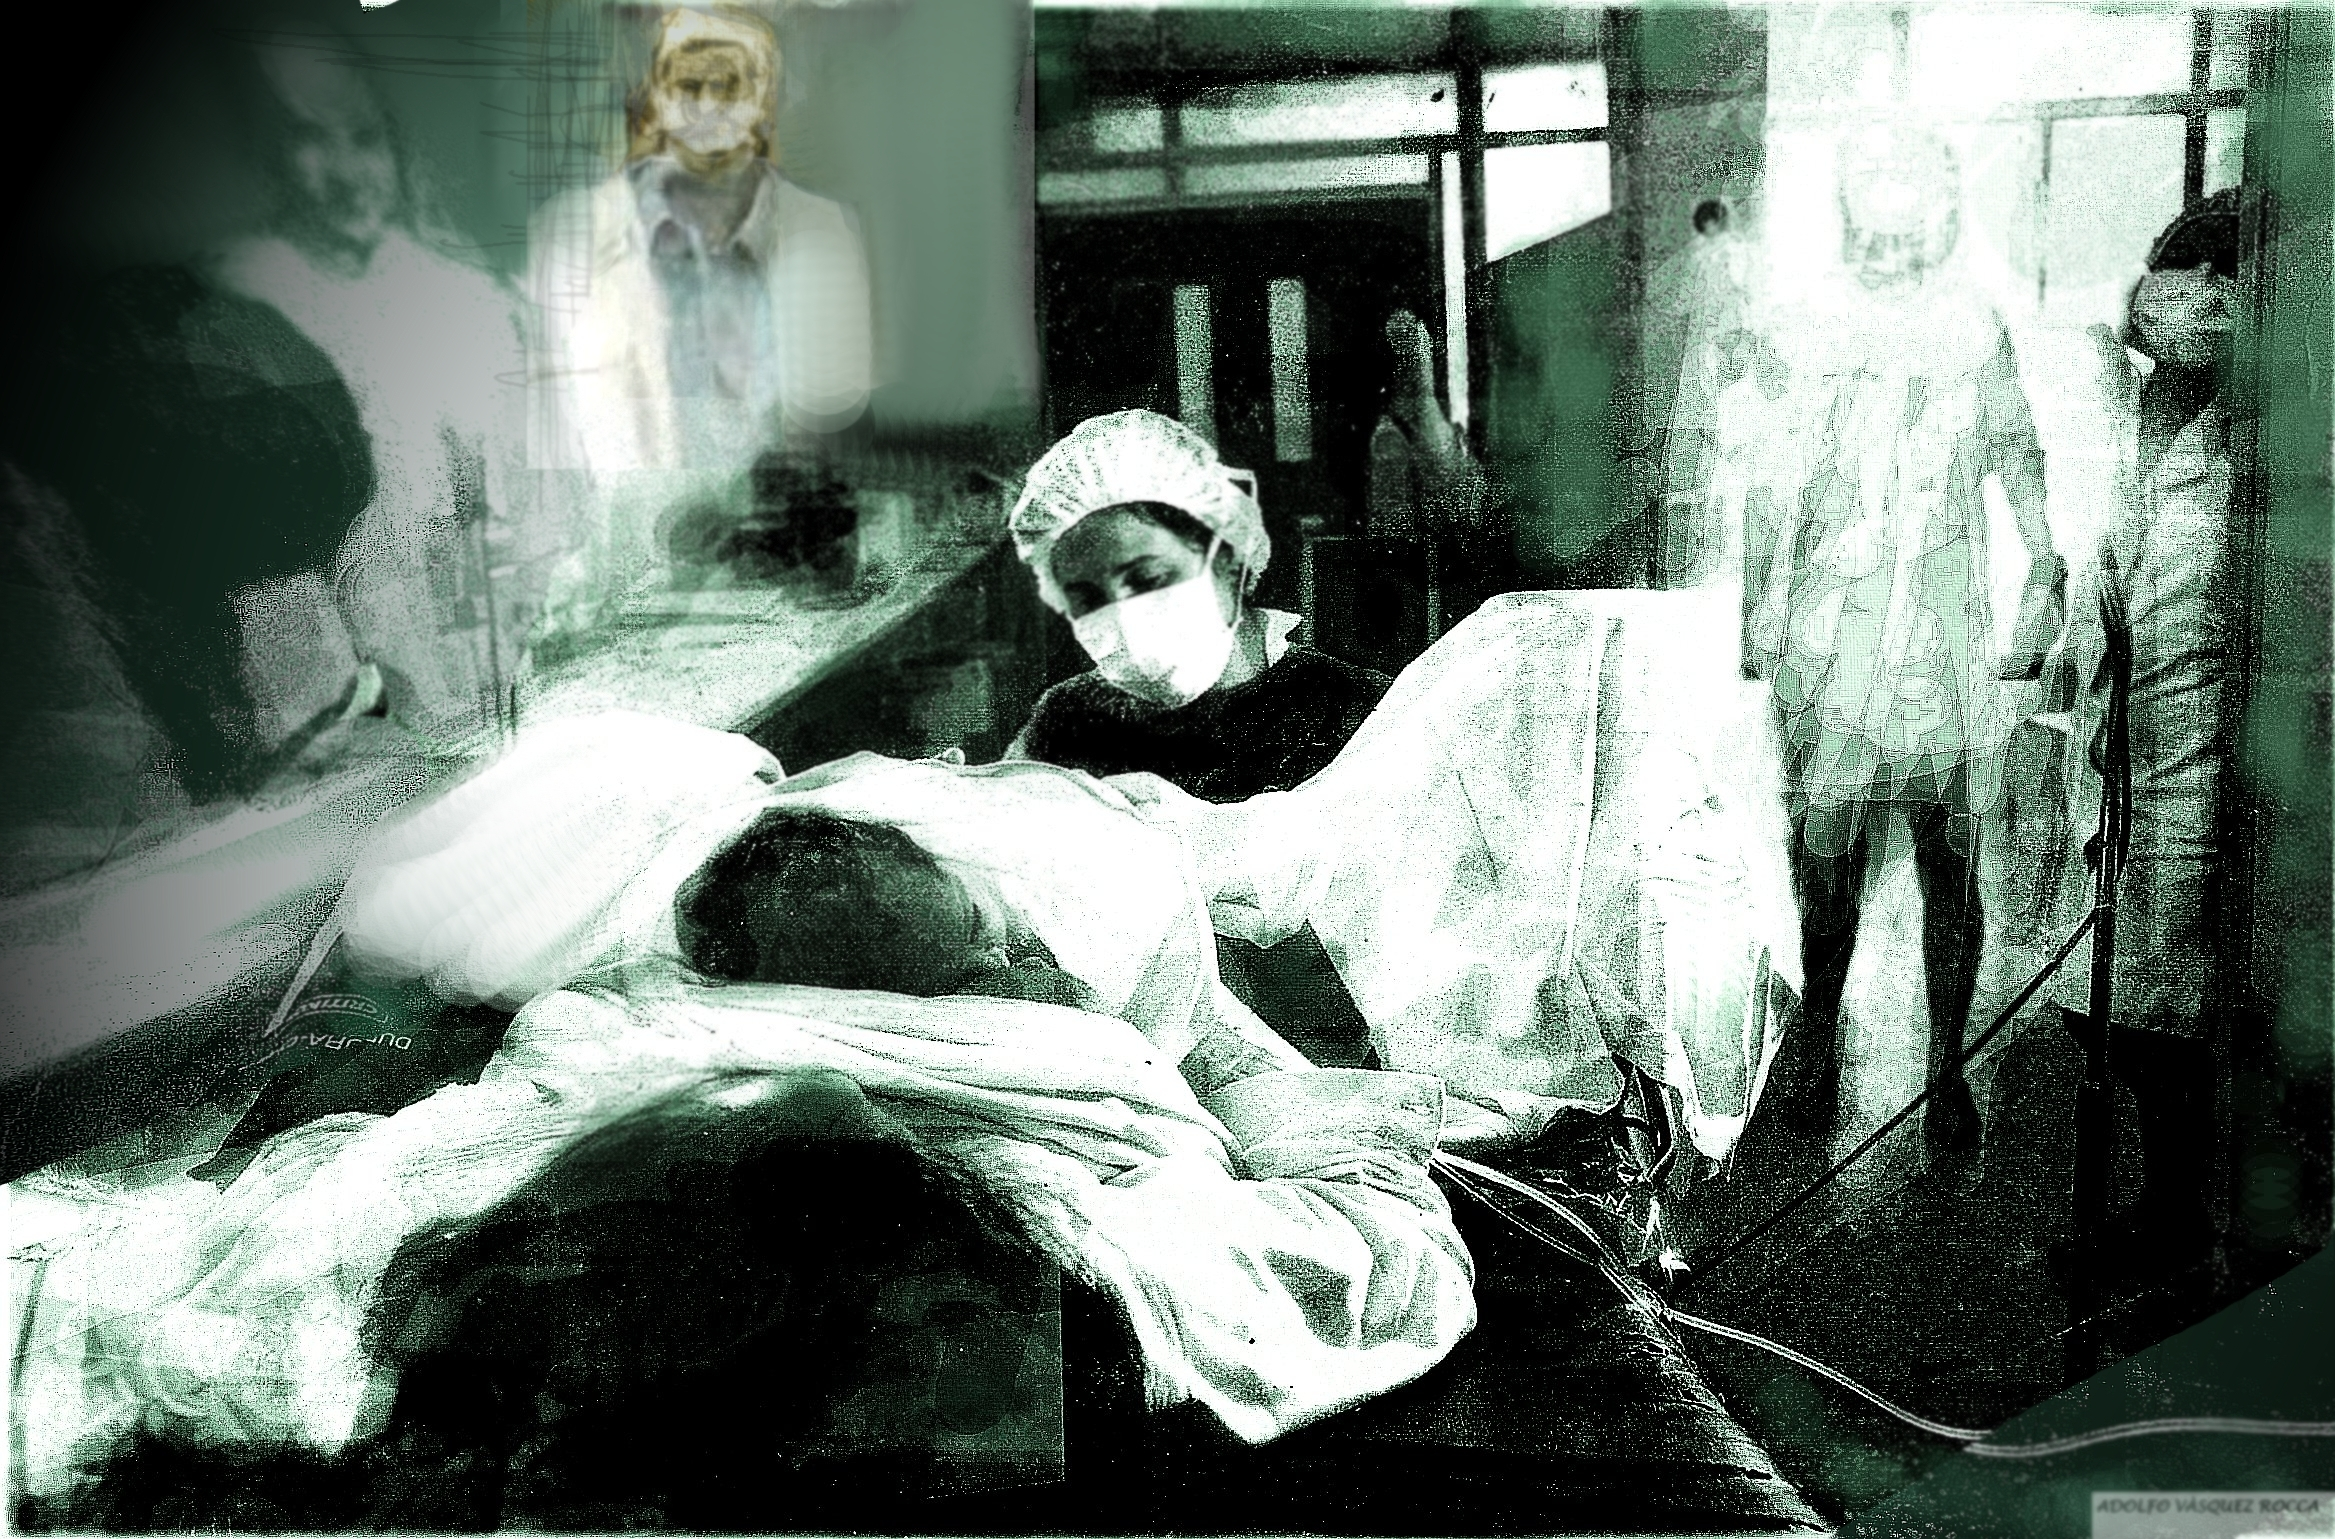 Obra___Pabellon_Medicina_Critica_por_Adolfo_Vasquez_Rocca_Revista_Almiar_Margen_Cero_enero_16